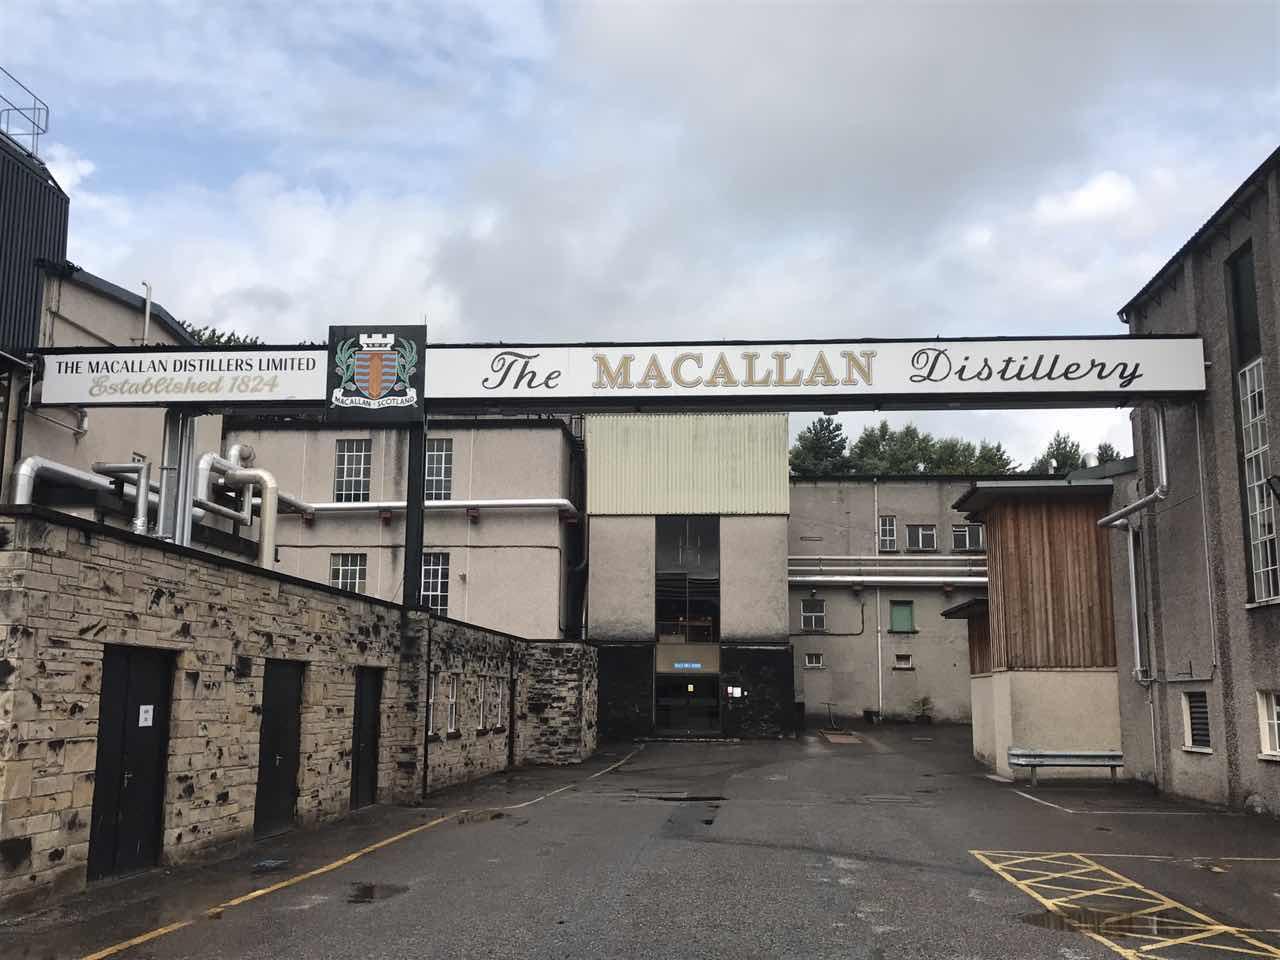 The Macallan 2018